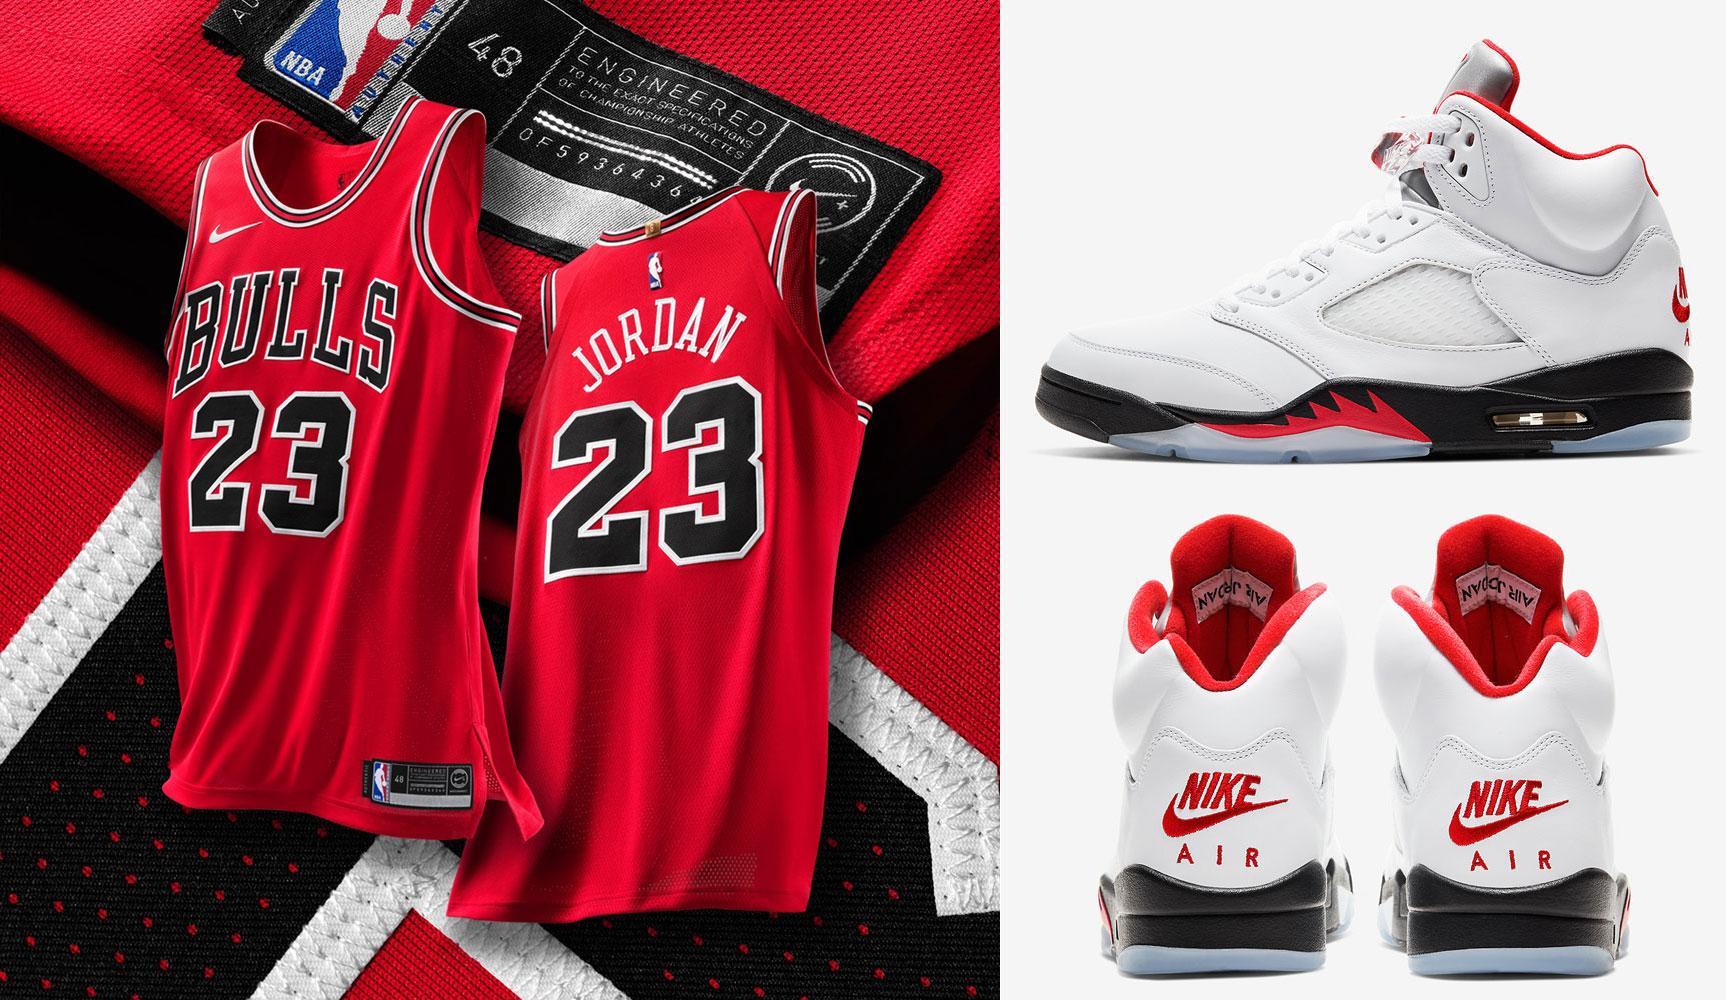 air-jordan-5-fire-red-2020-bulls-clothing-match